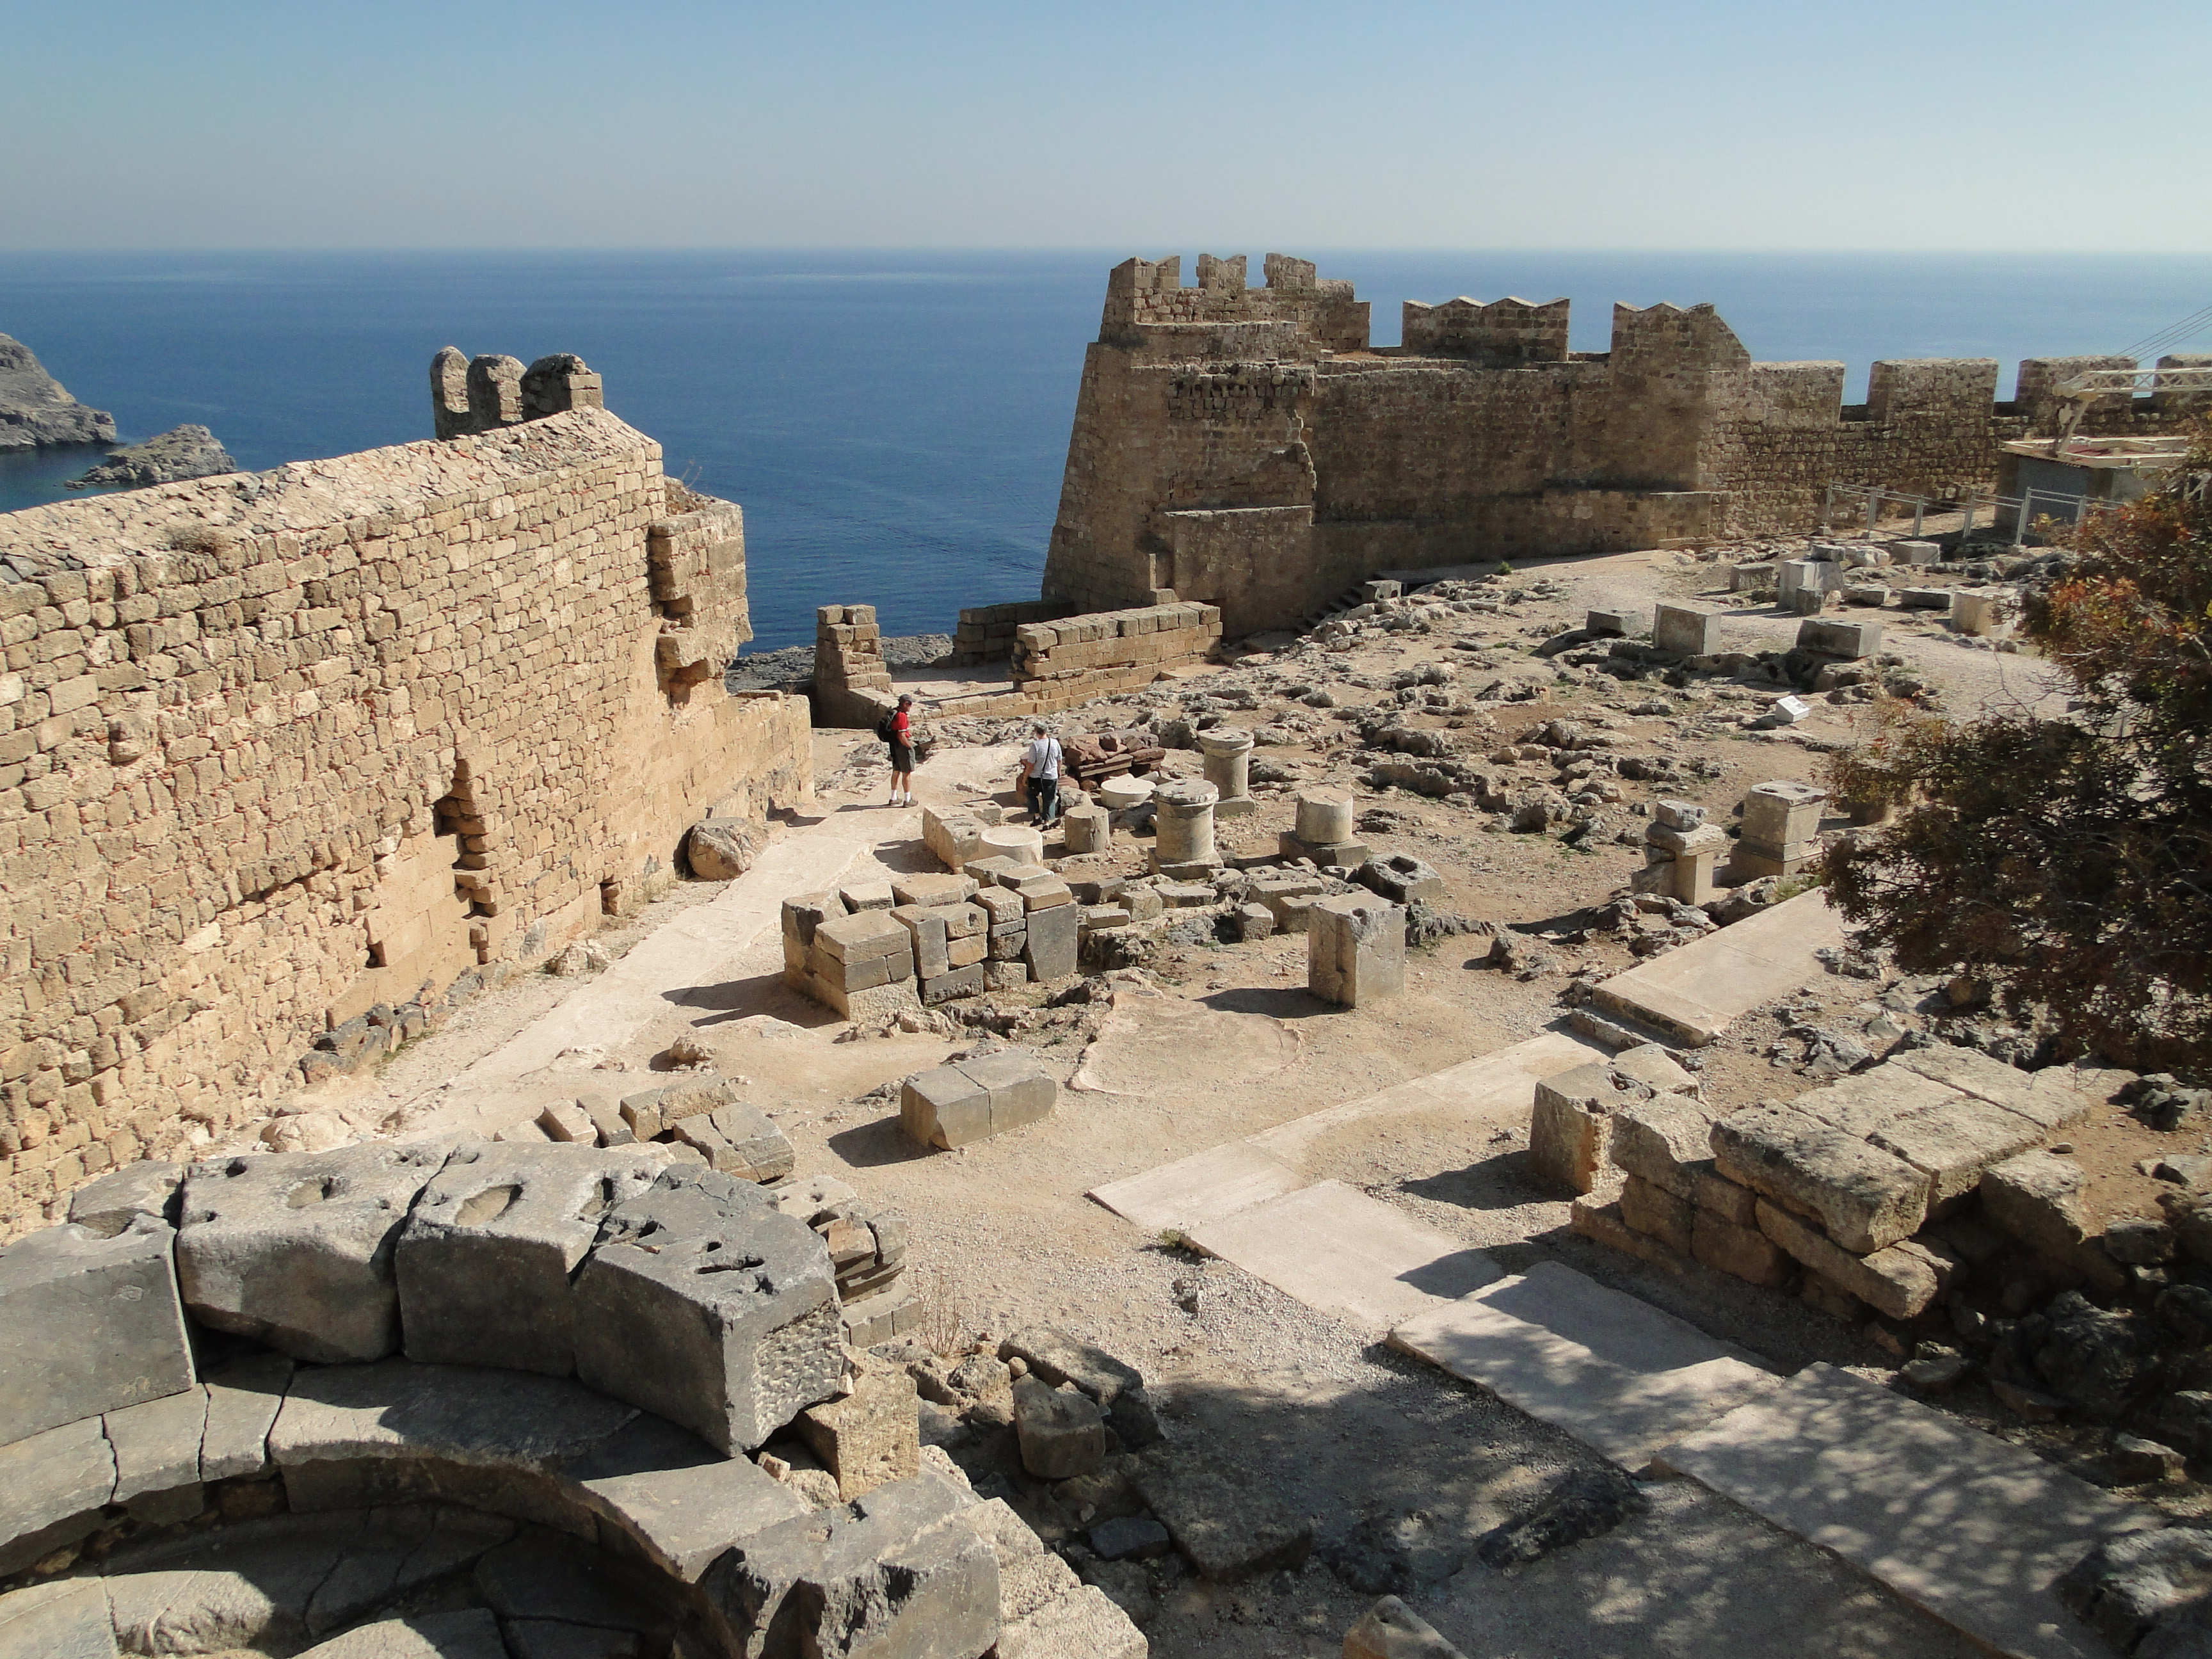 File:Acropolis of Lindos 01.jpg - Wikimedia Commons